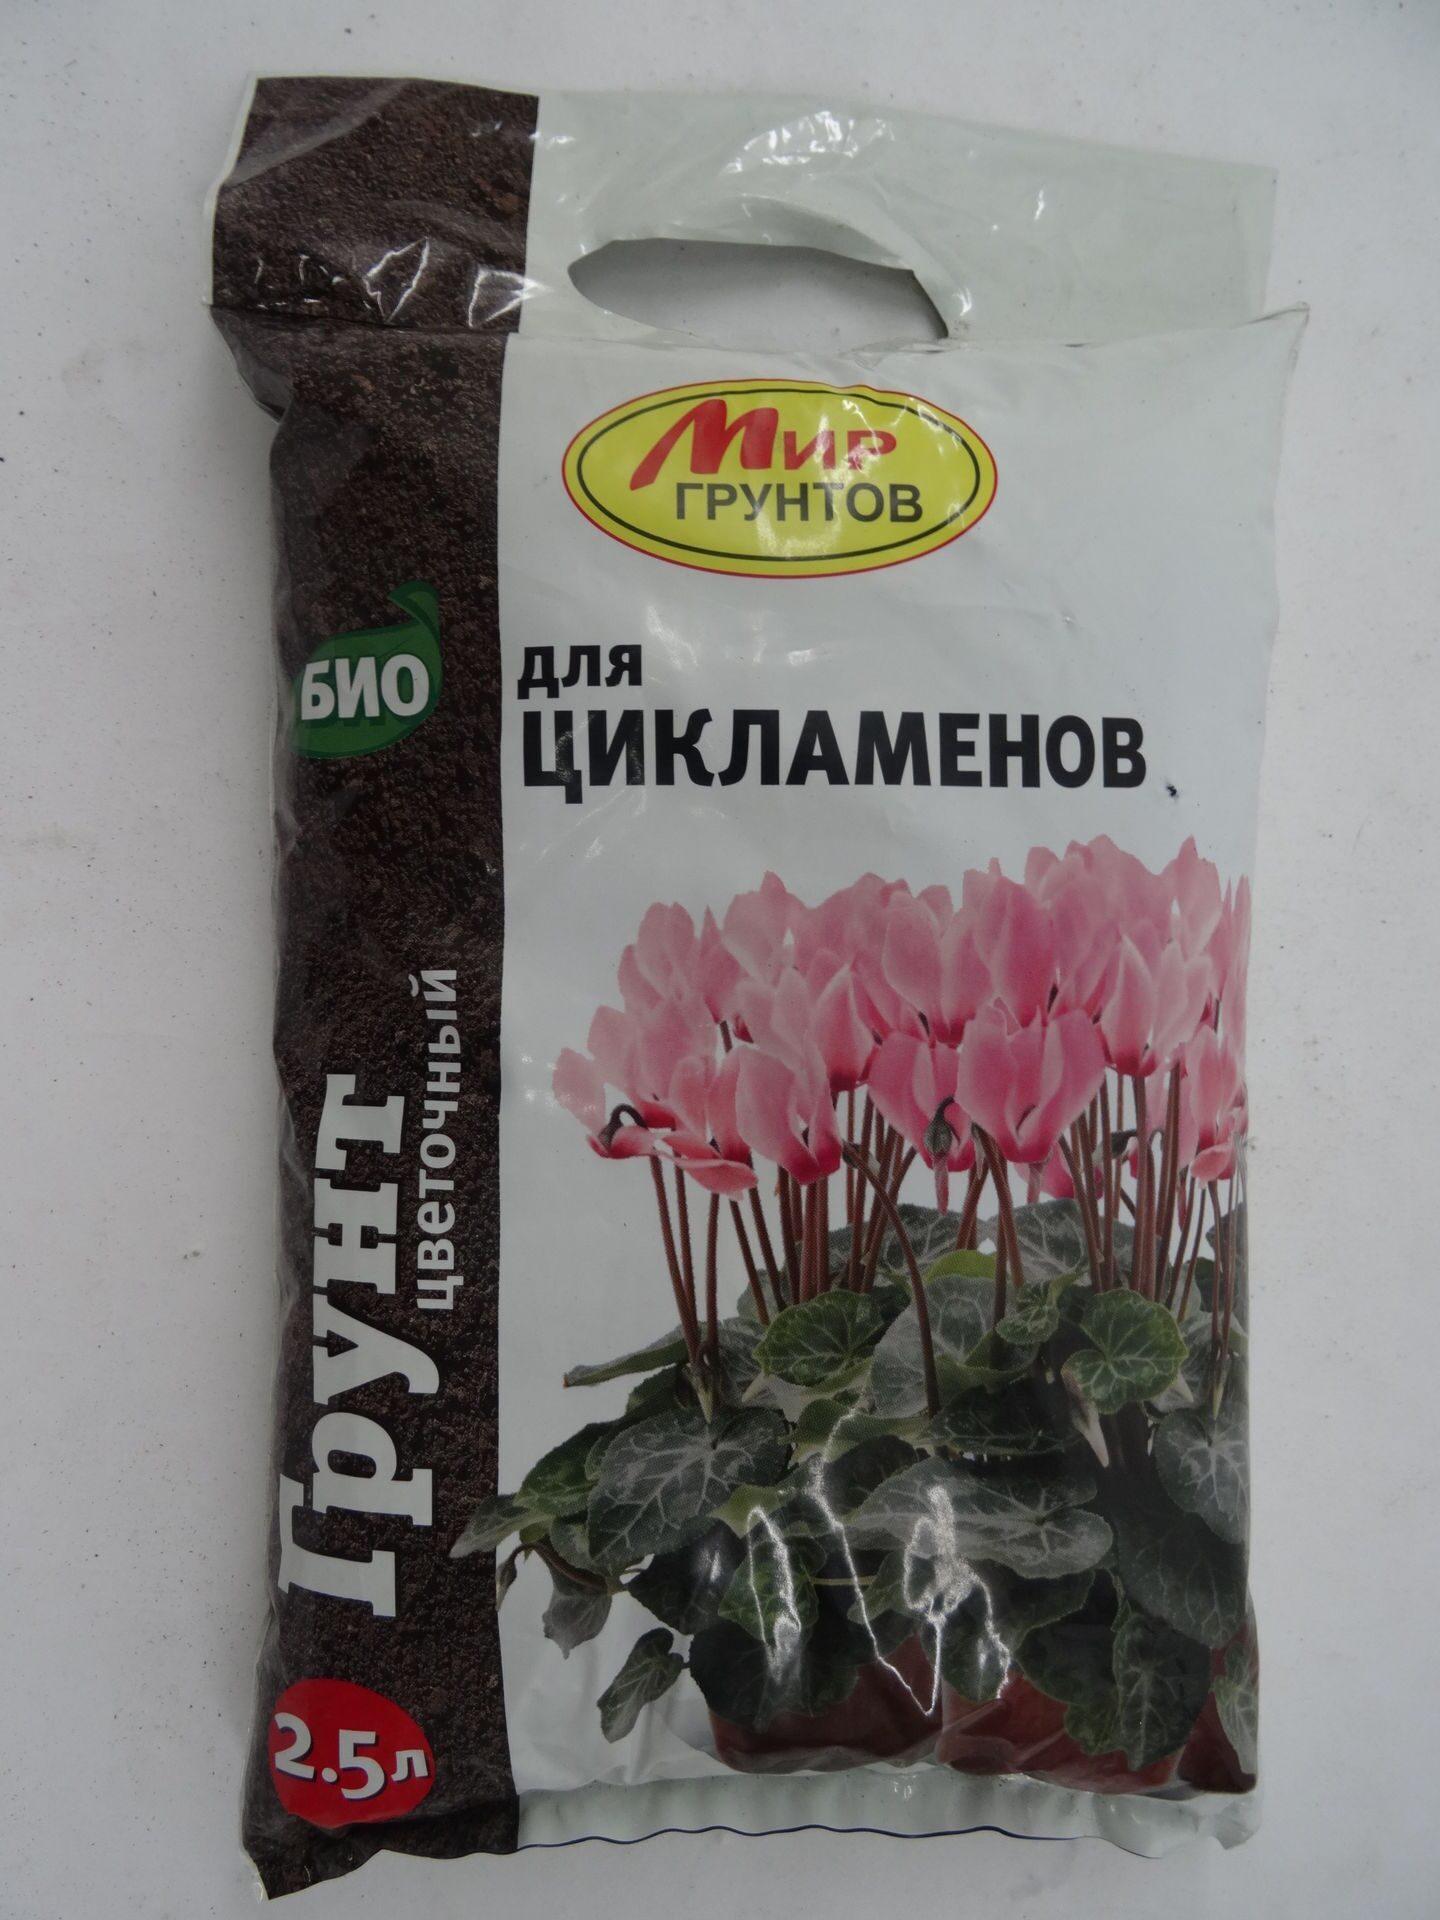 Грунт для орхидеи фаленопсис какой нужен? 62